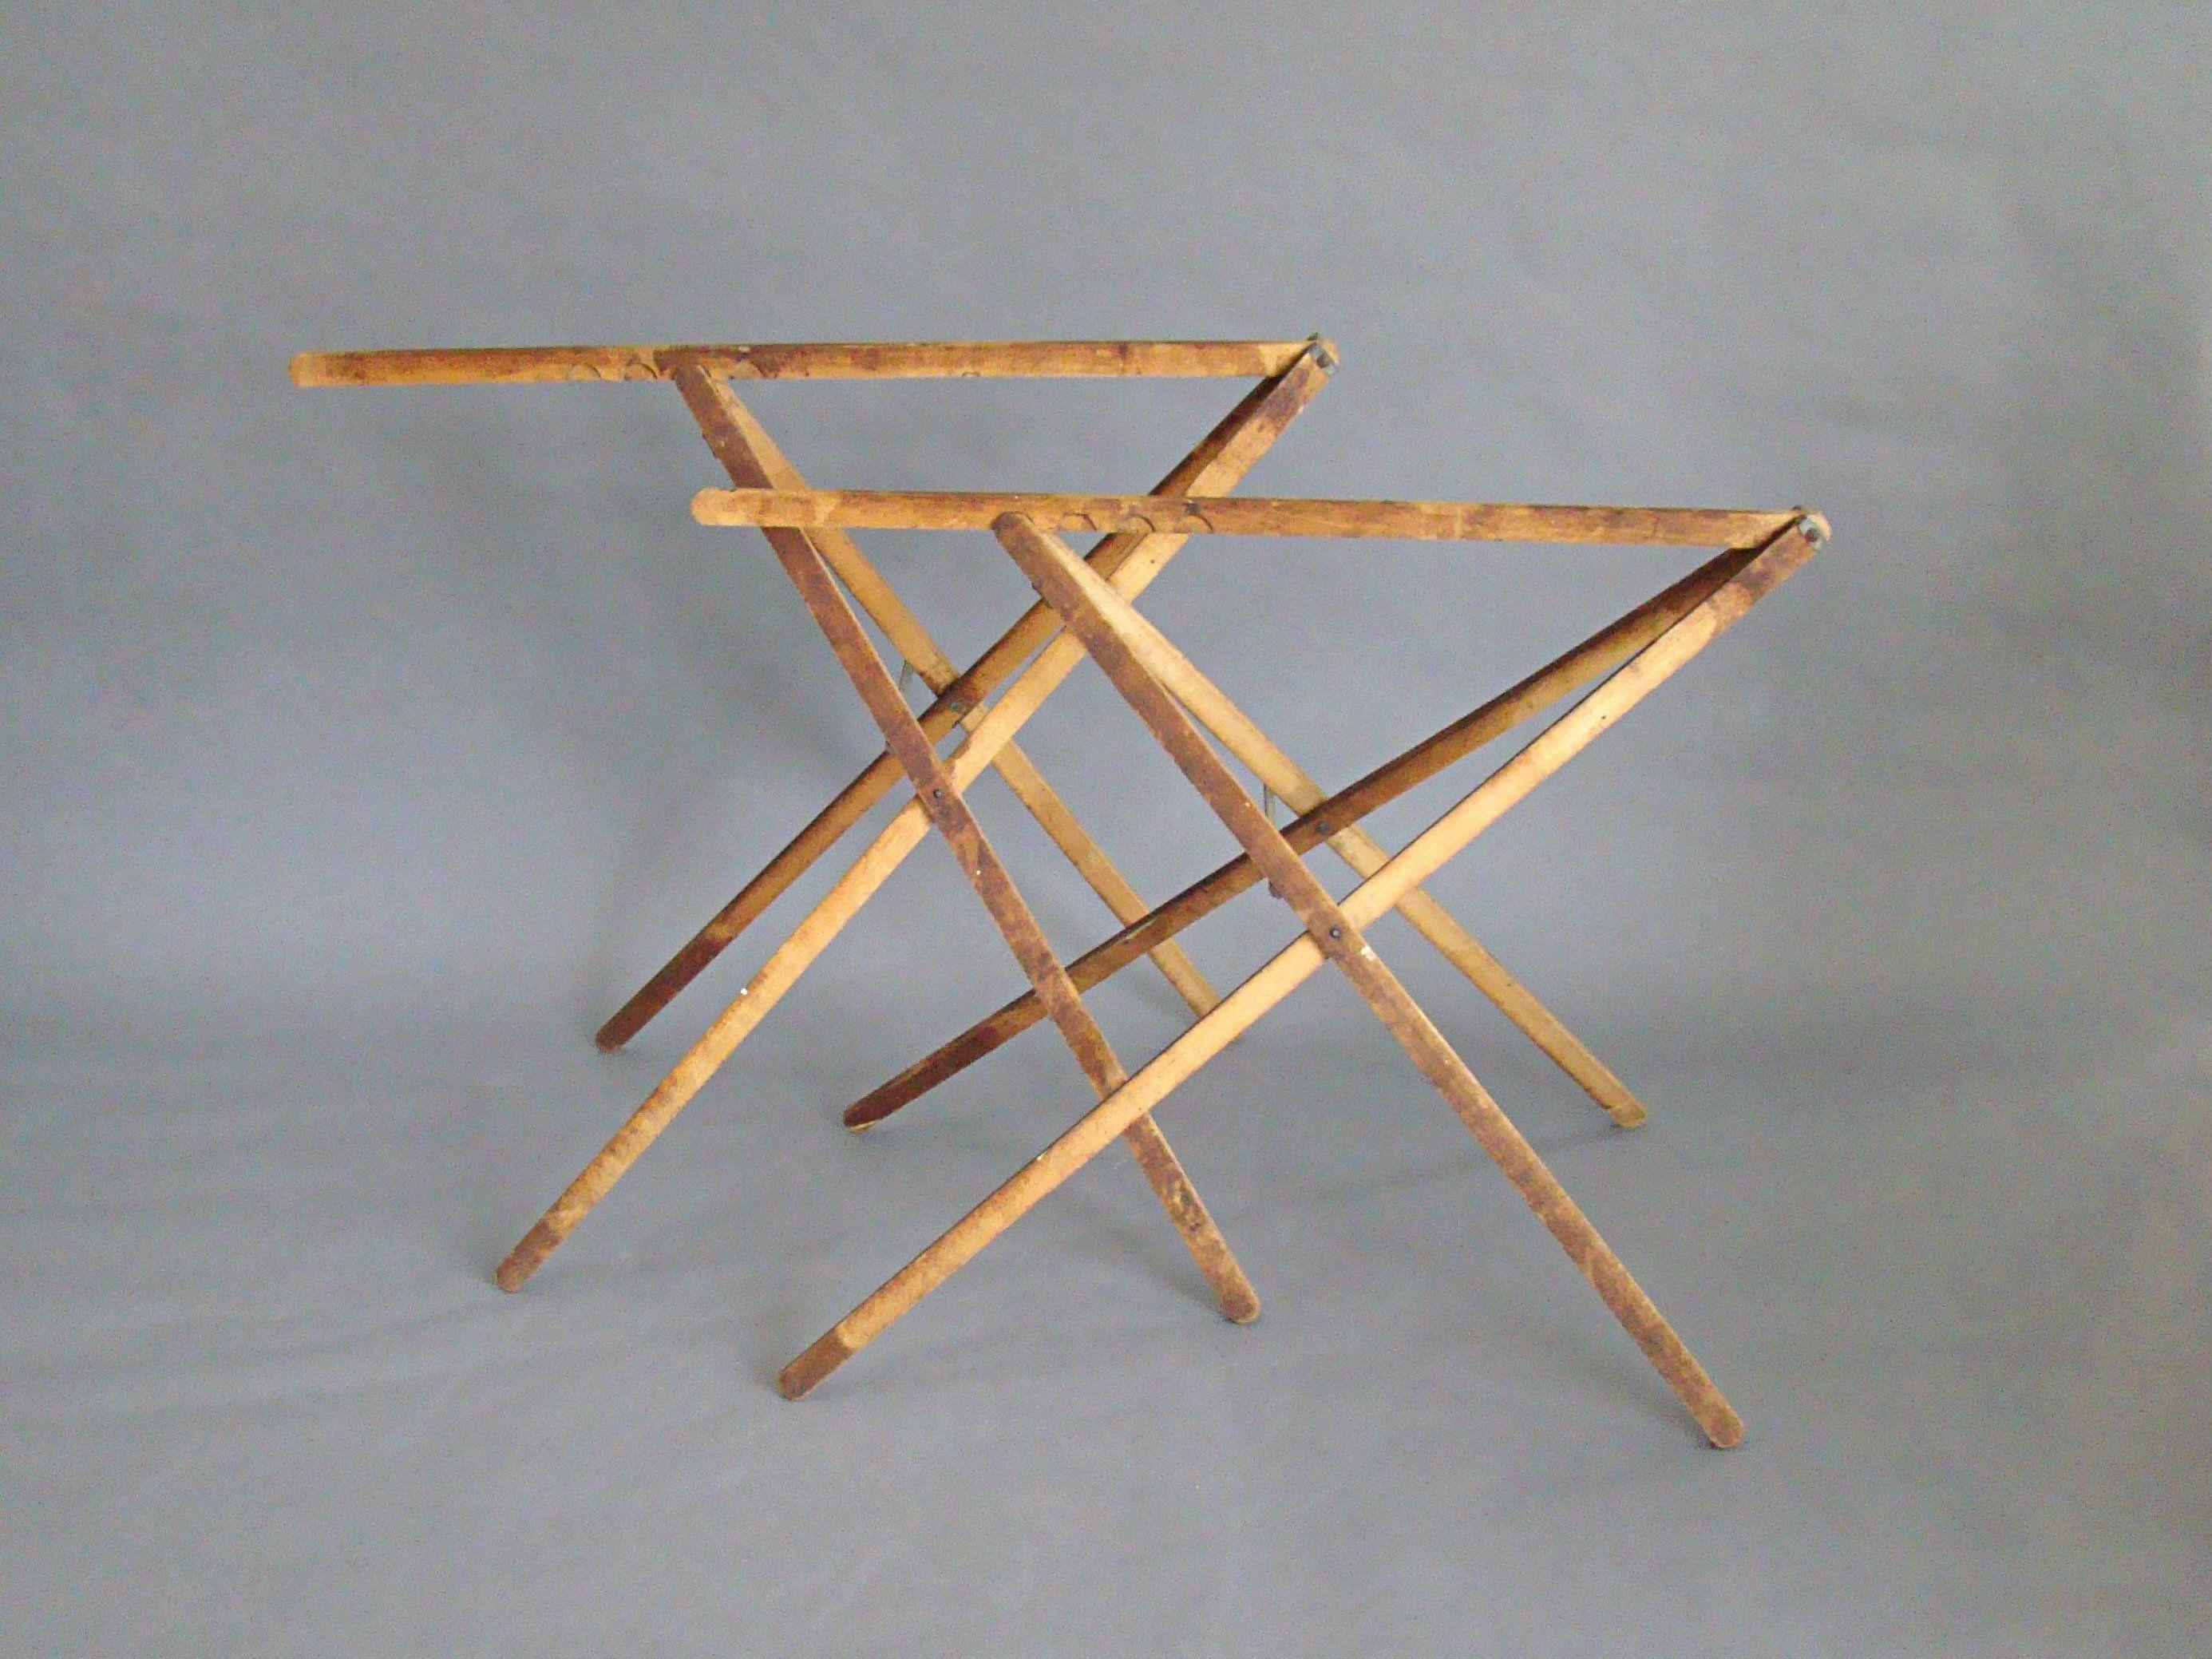 Wallpaper Table Legs Trestle Legs Folding Table Legs Etsy In 2020 Table Legs Folding Table Legs Portable Table